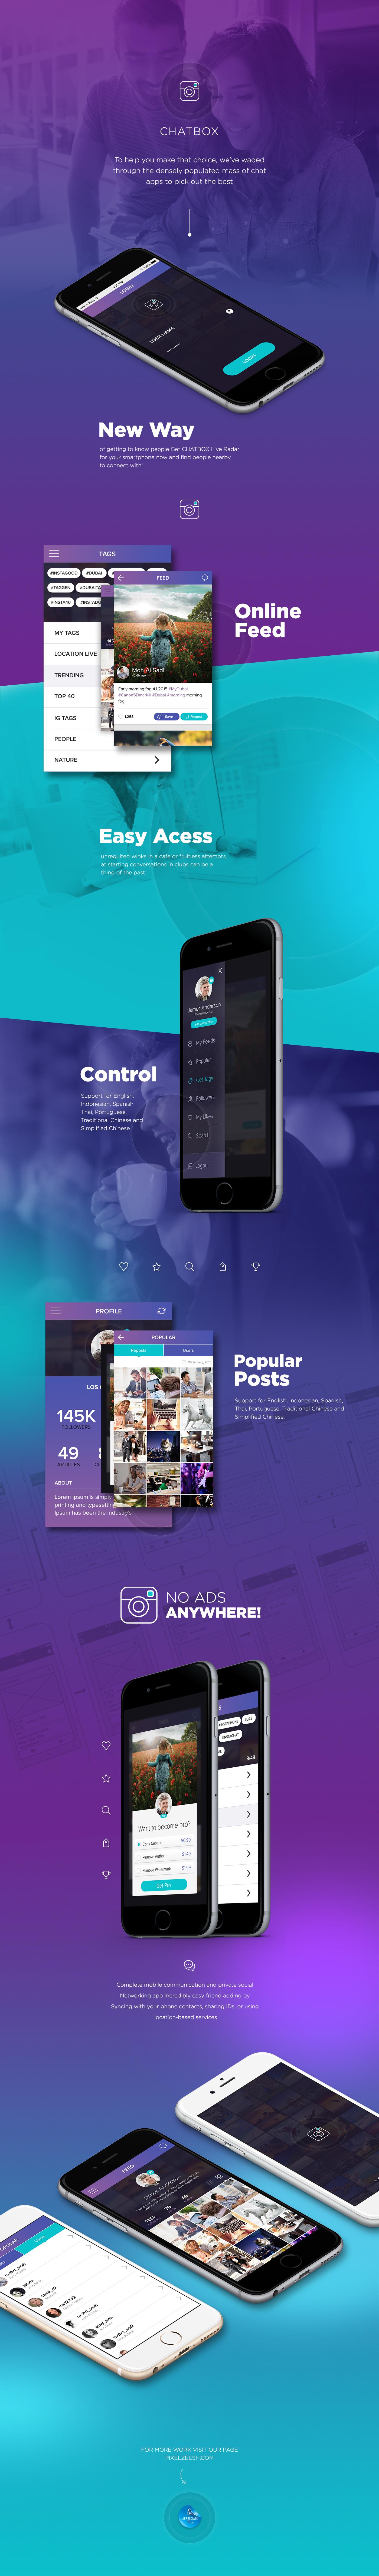 chatbox chatting pixelzeesh ios app iphone Mockup Samsung iosapp